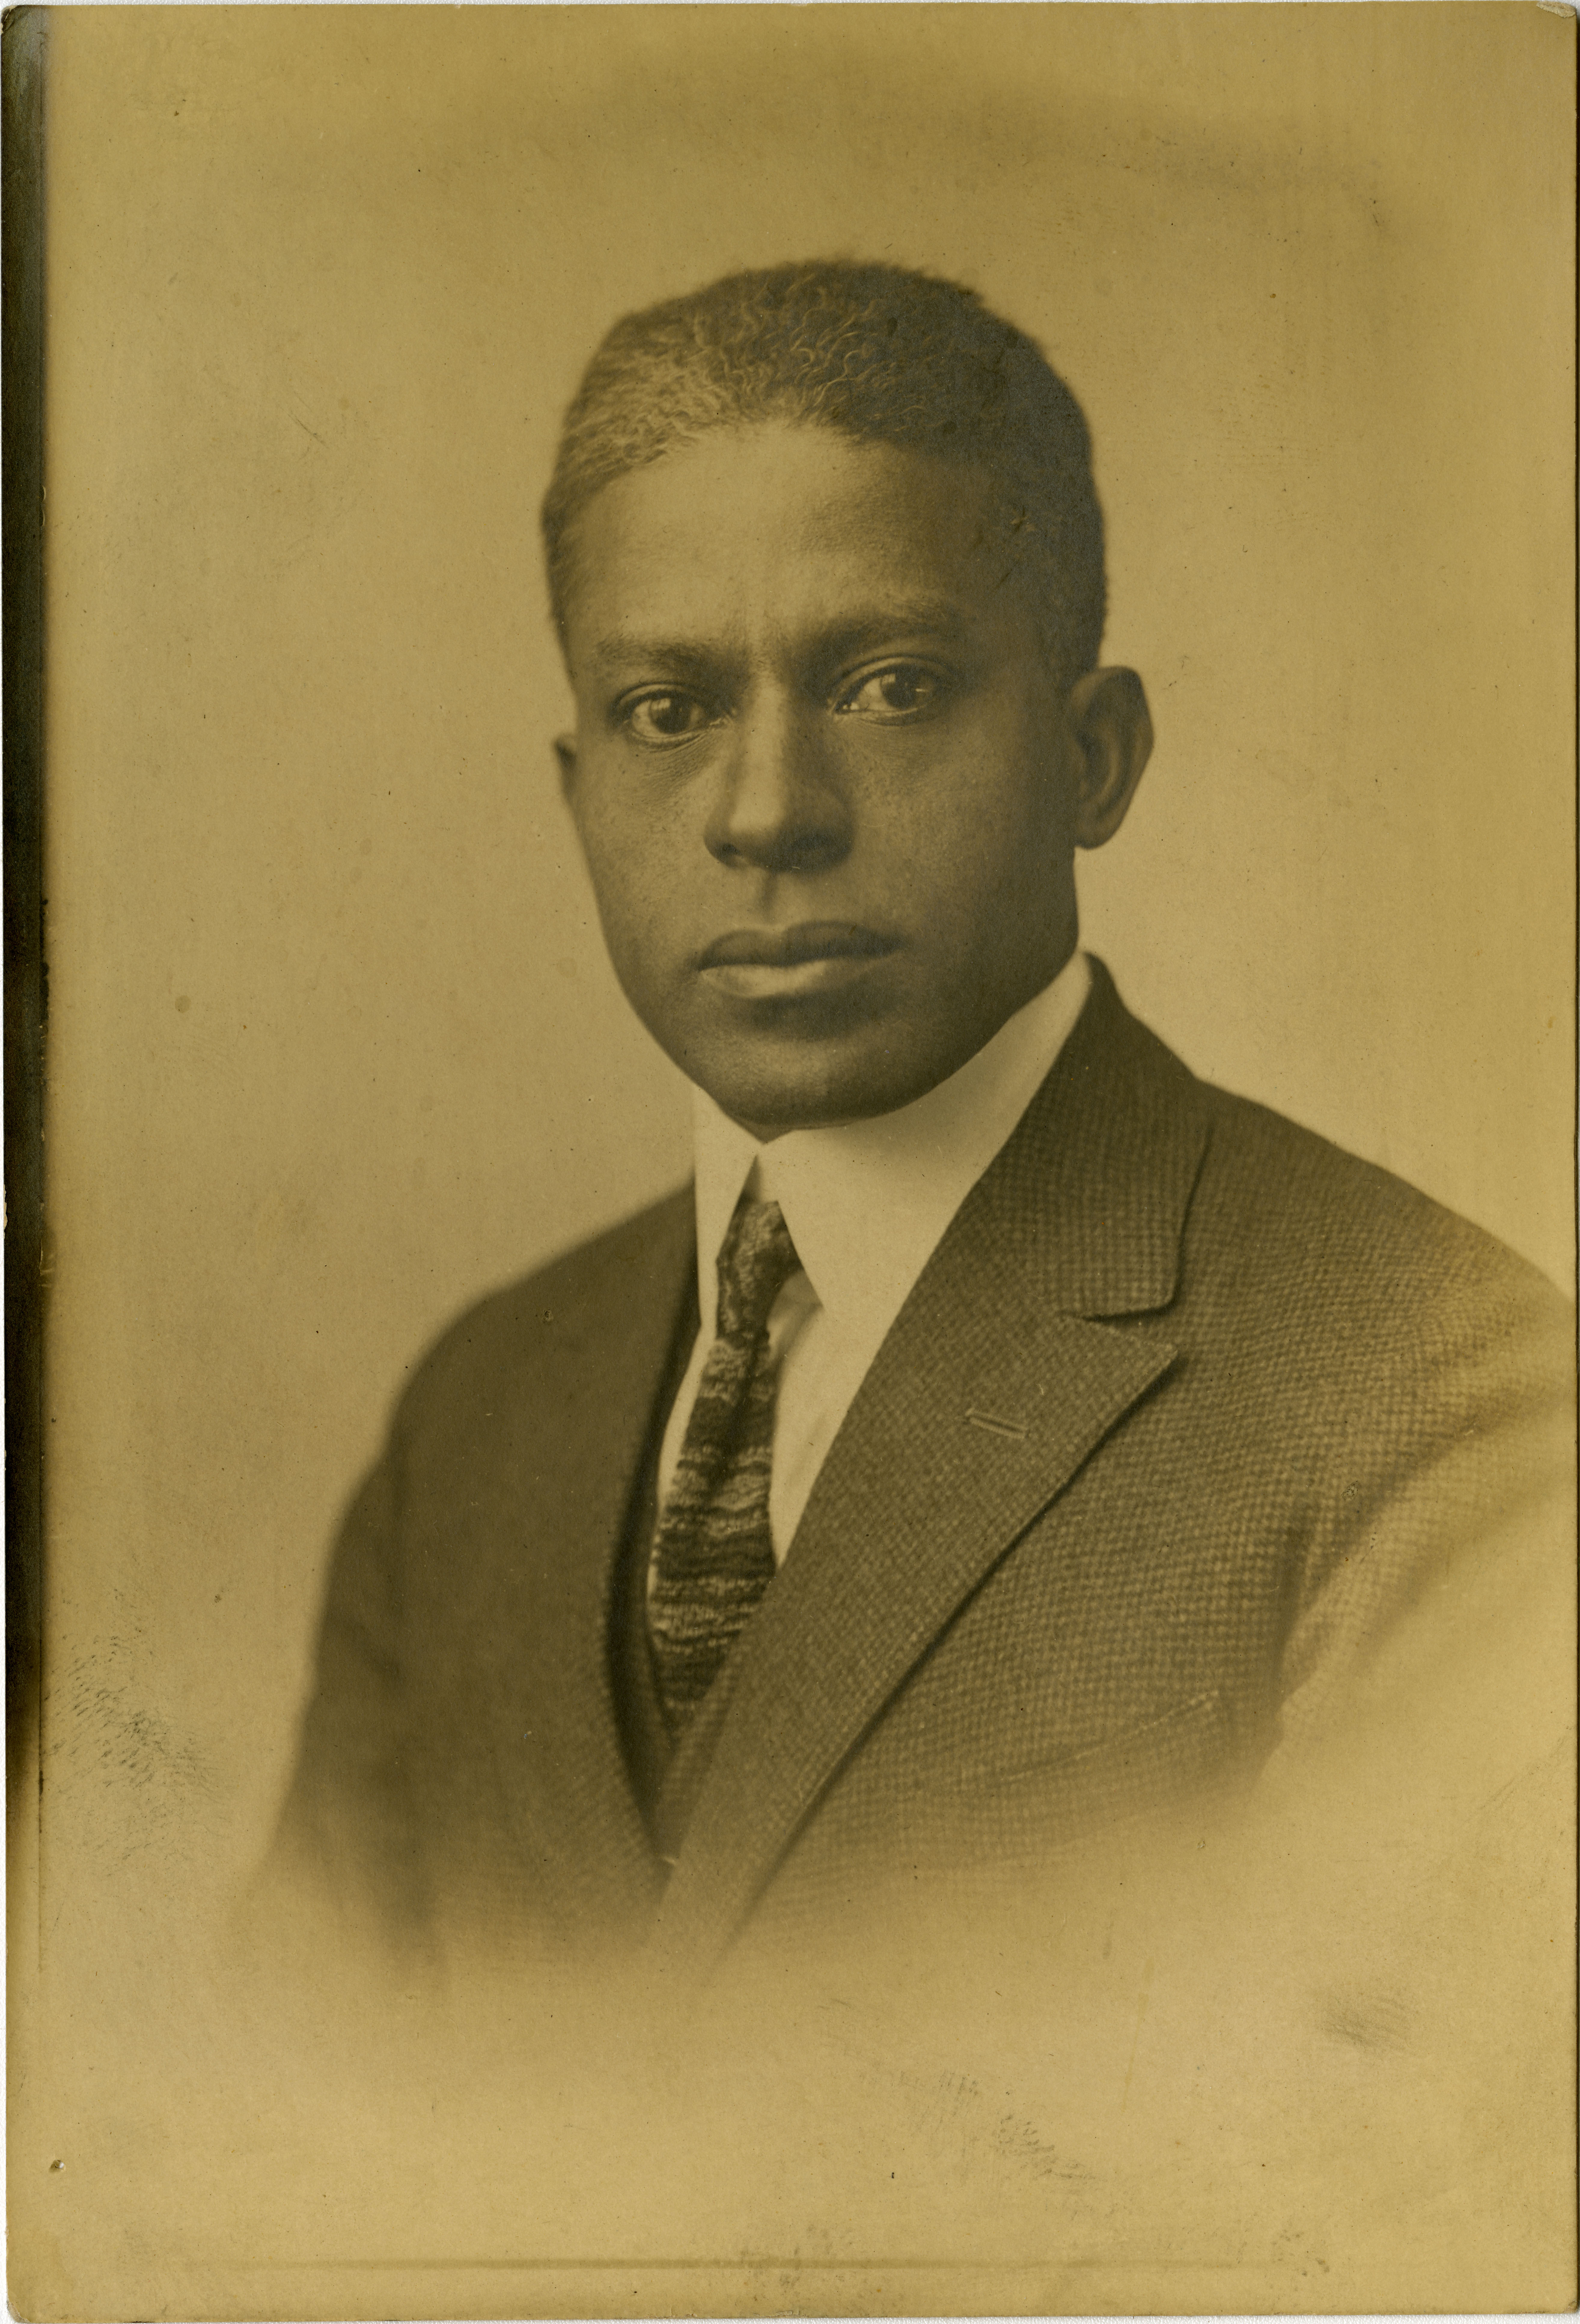 Formal portrait of Herbert U. Seabrook, Sr.